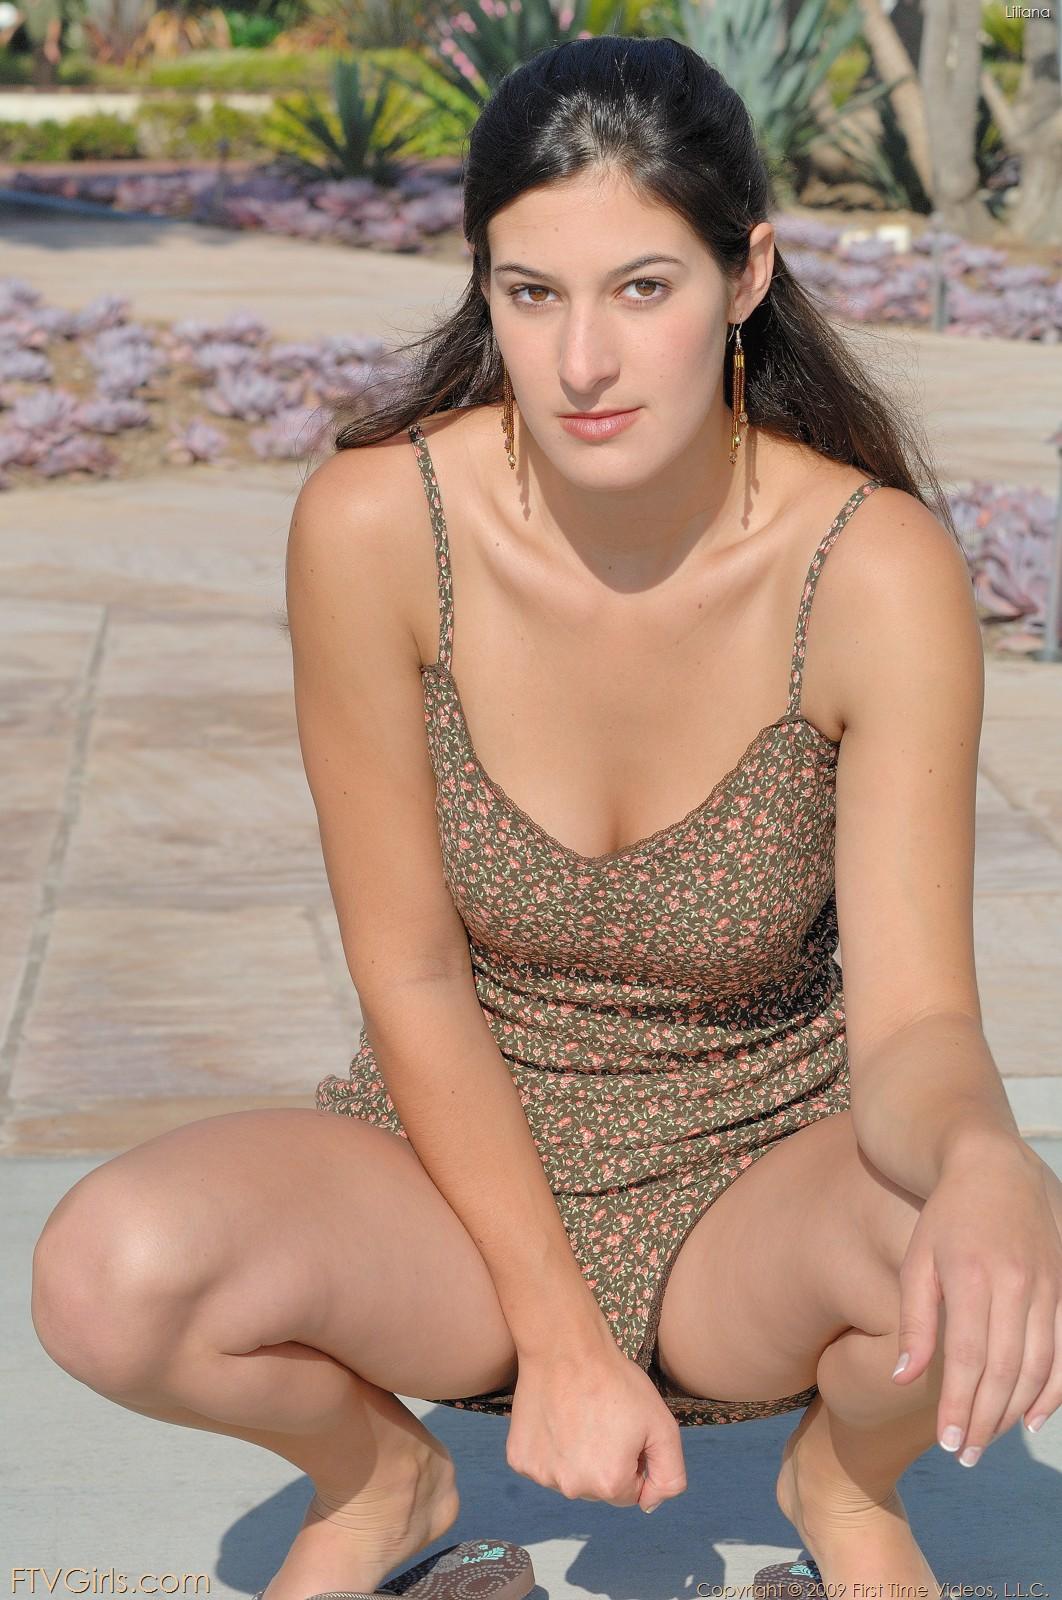 liliana ams nude @~24